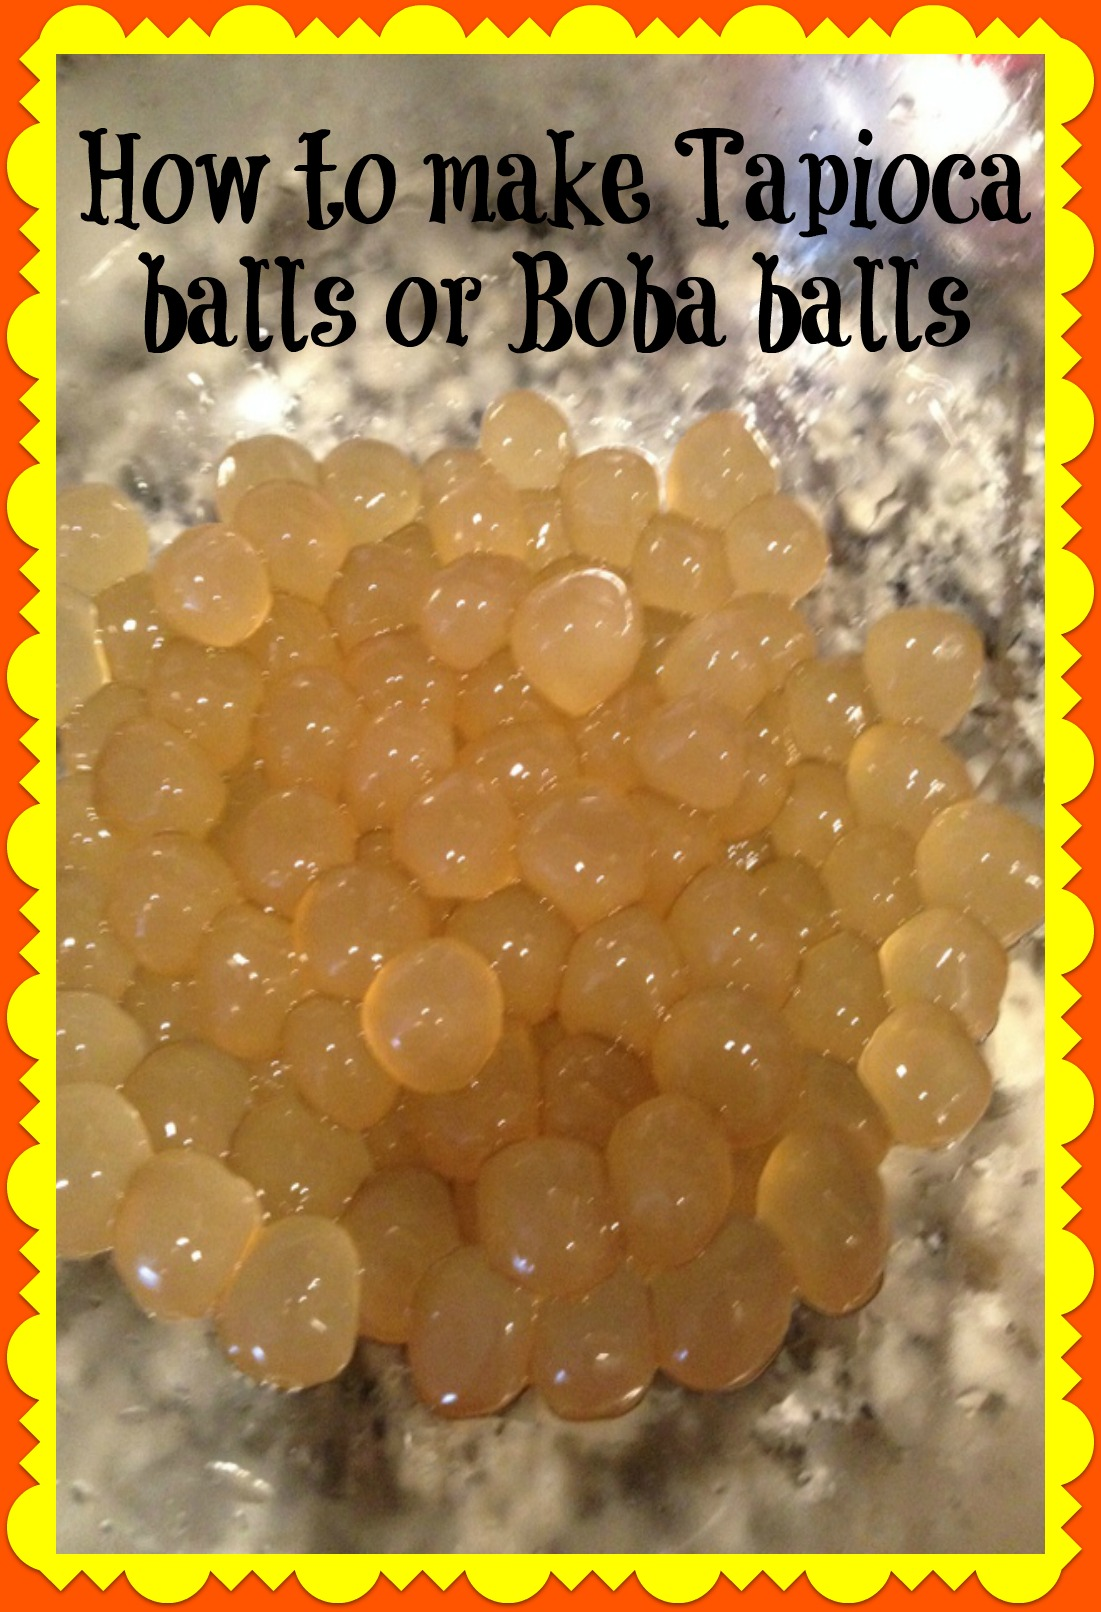 How to make Tapioca Balls